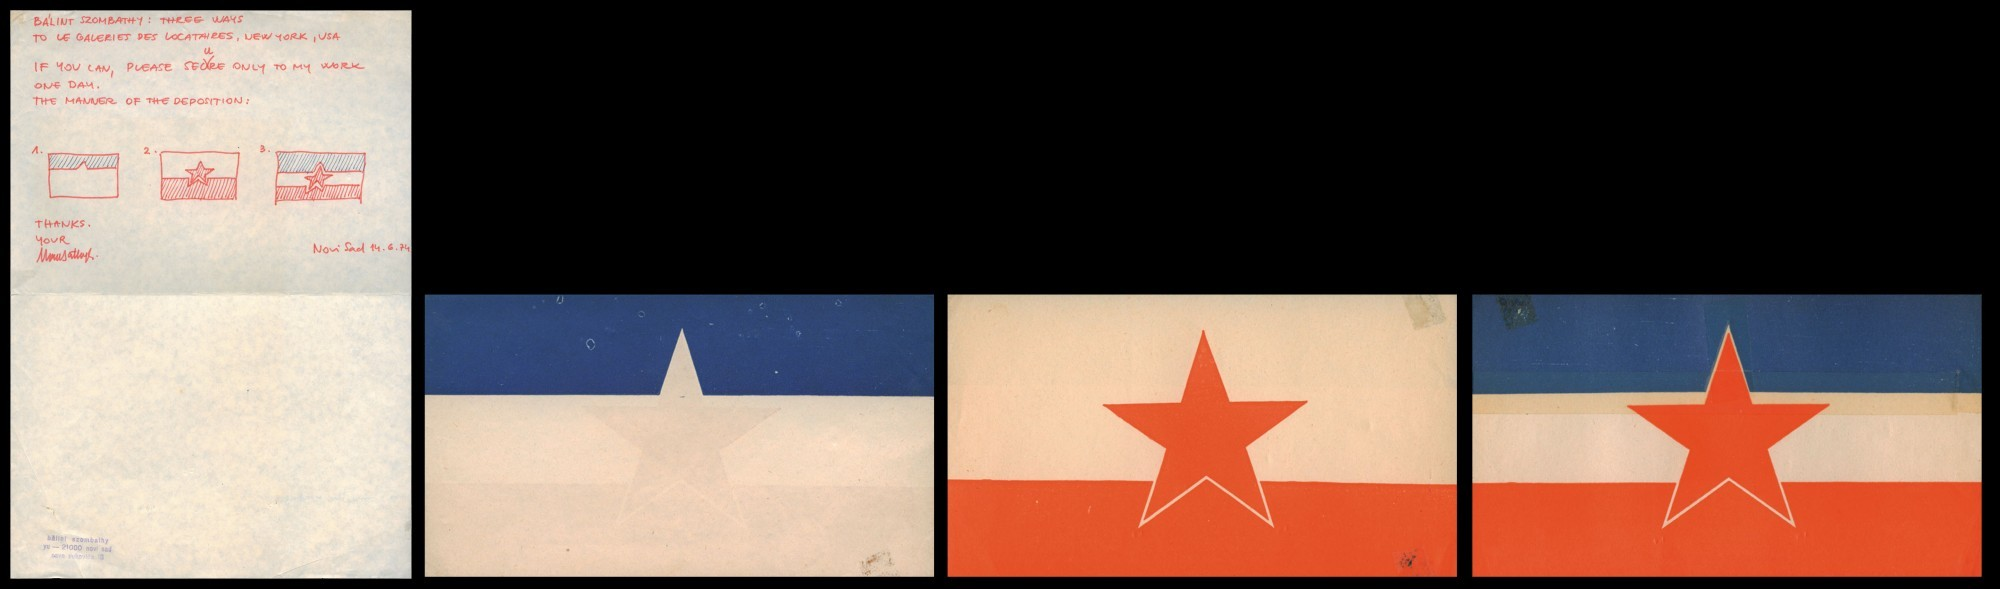 Bosch + Bosch Group (BaElint Szombathy), Three modes -Deconstruction of Yugoslavia, 1974, Marinko Sudac Collection